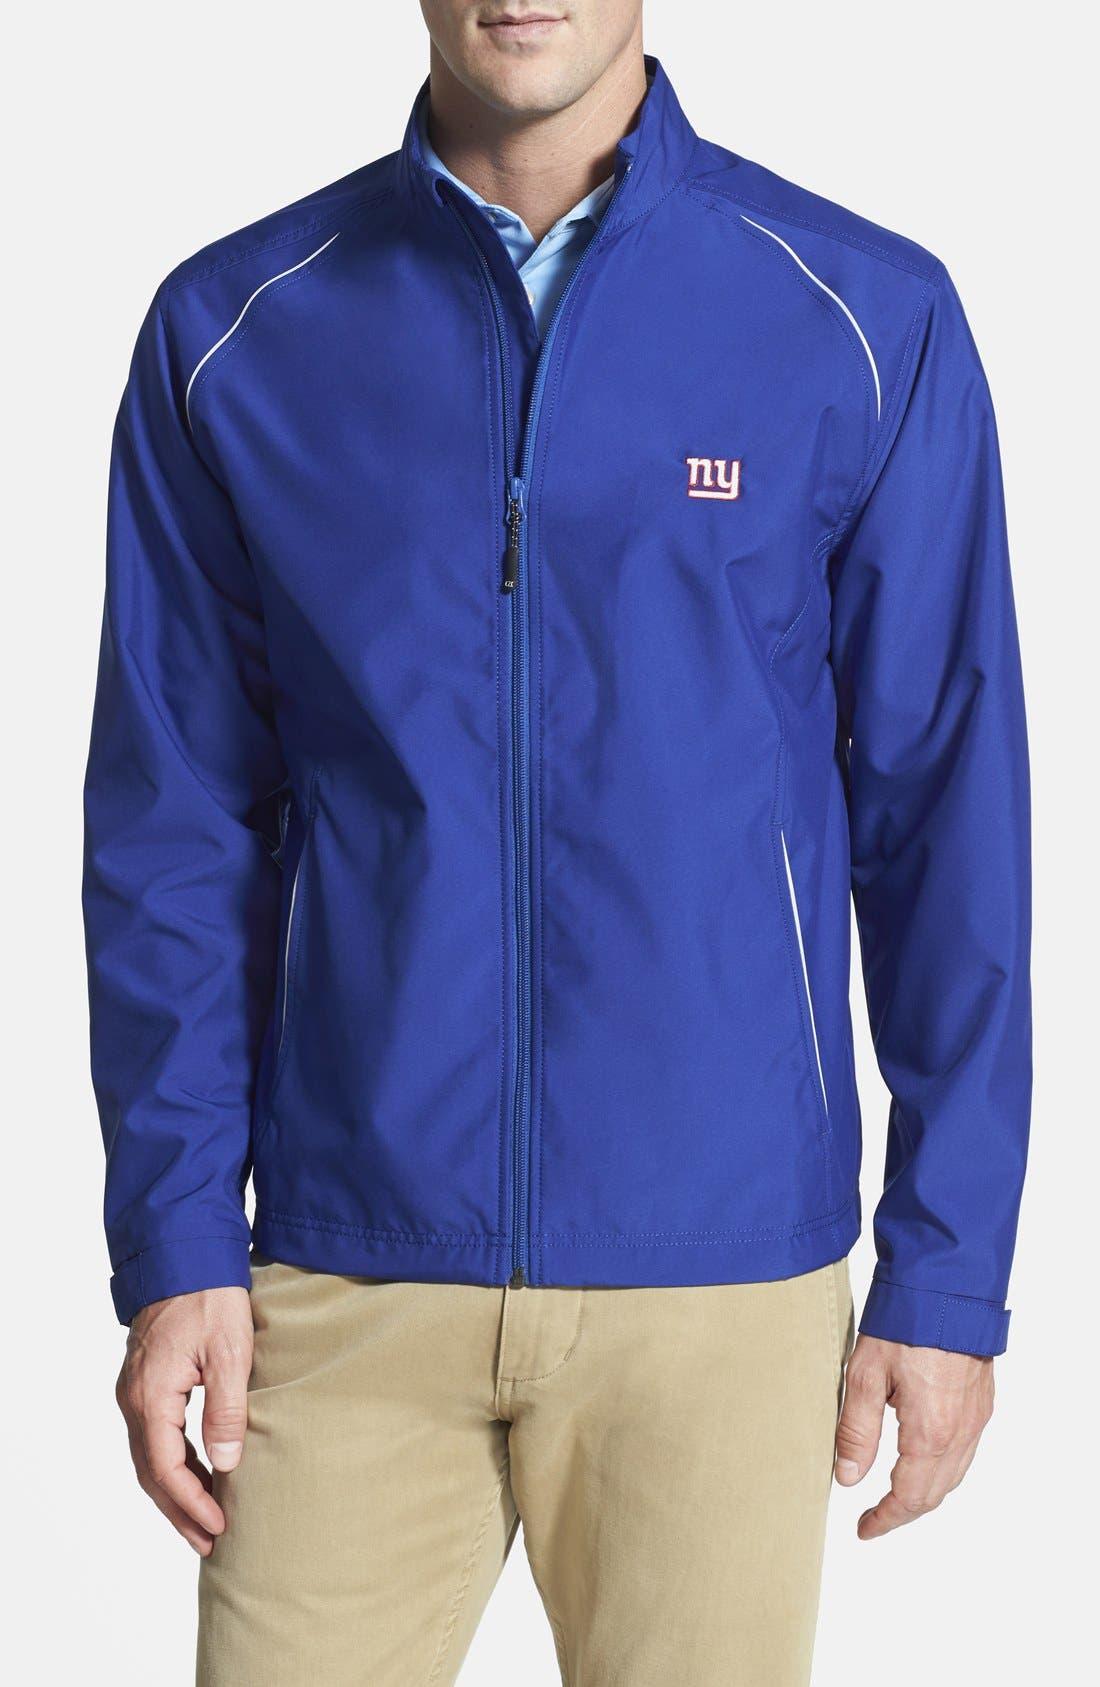 Main Image - Cutter & Buck New York Giants - Beacon WeatherTec Wind & Water Resistant Jacket